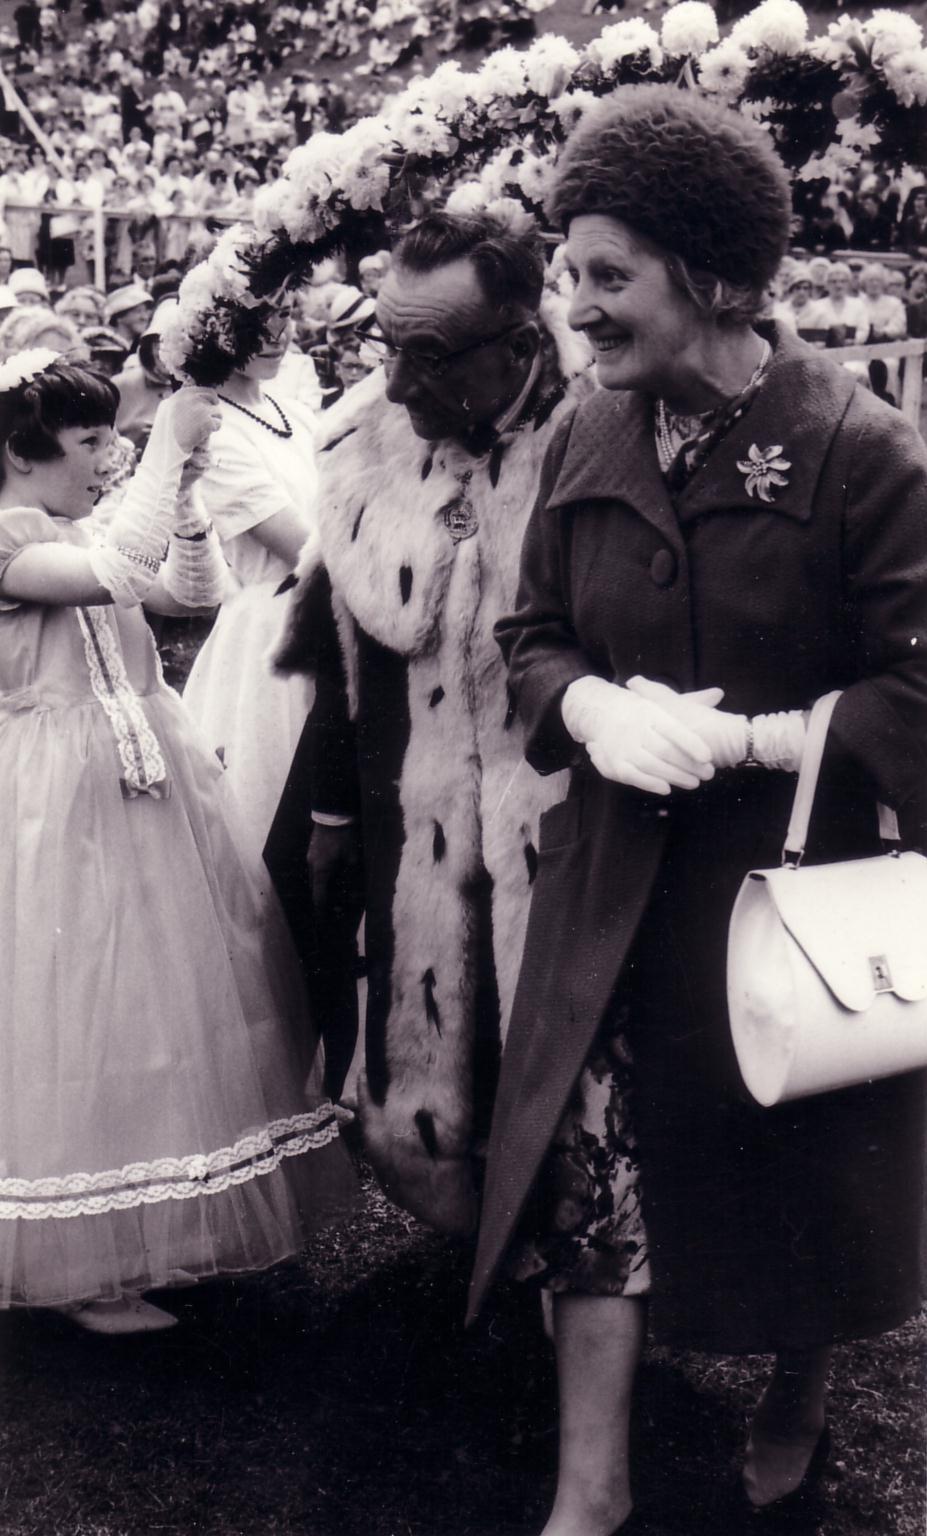 Mayor And Lady Walking Under Garland 1940s